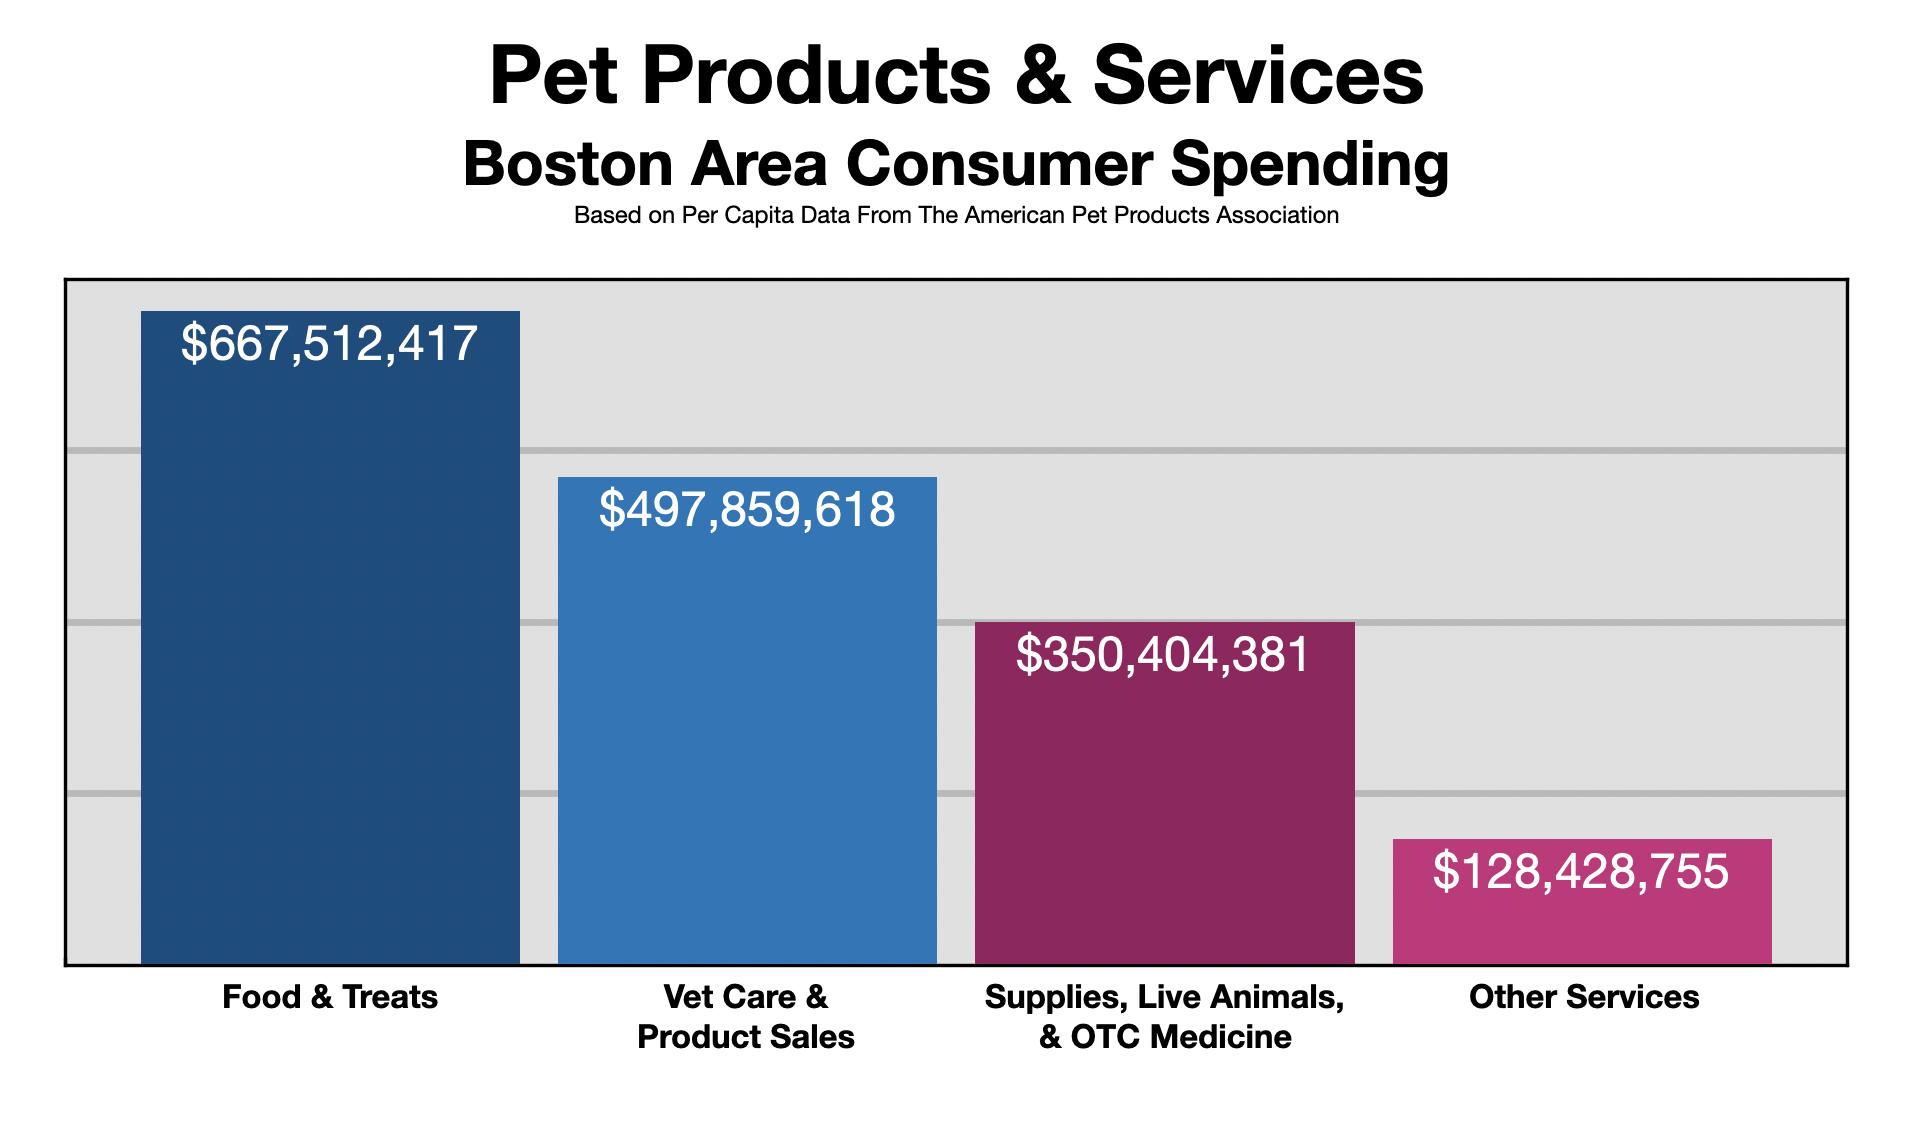 Pet Product Spending In Boston